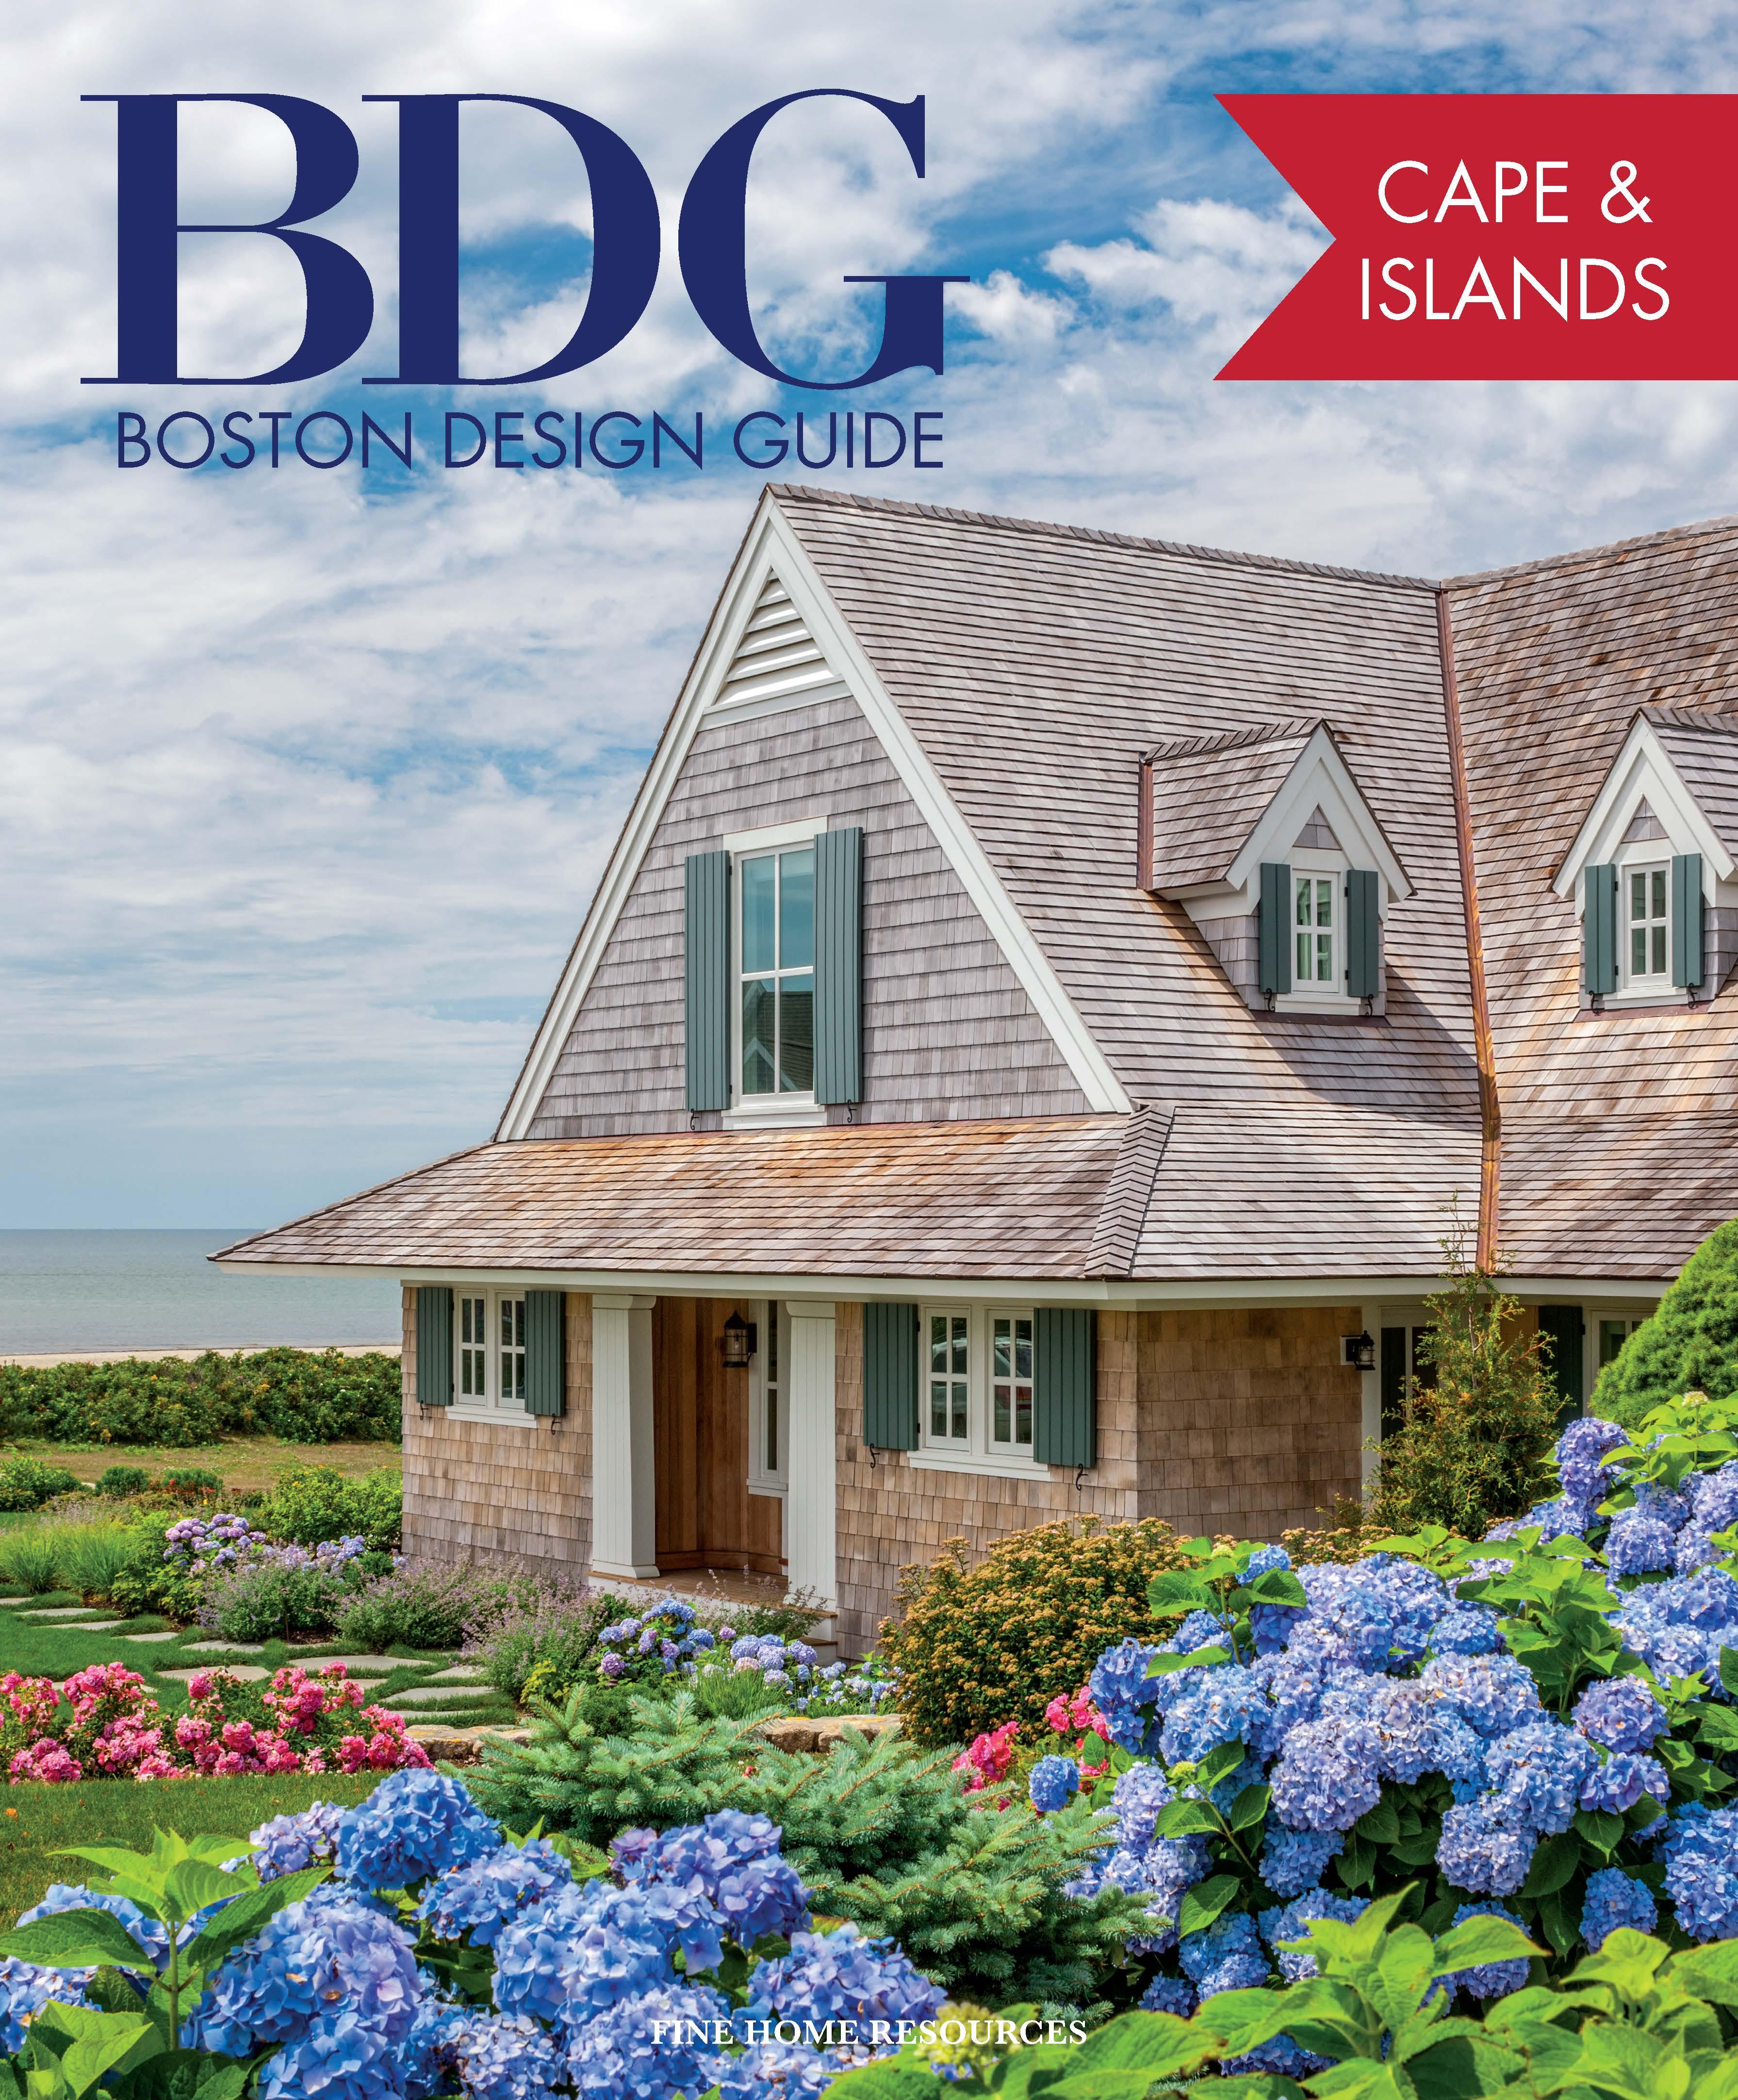 Boston Design Guide BDG home professionals on Cape Cod, Nantucket, Martha's Vineyard